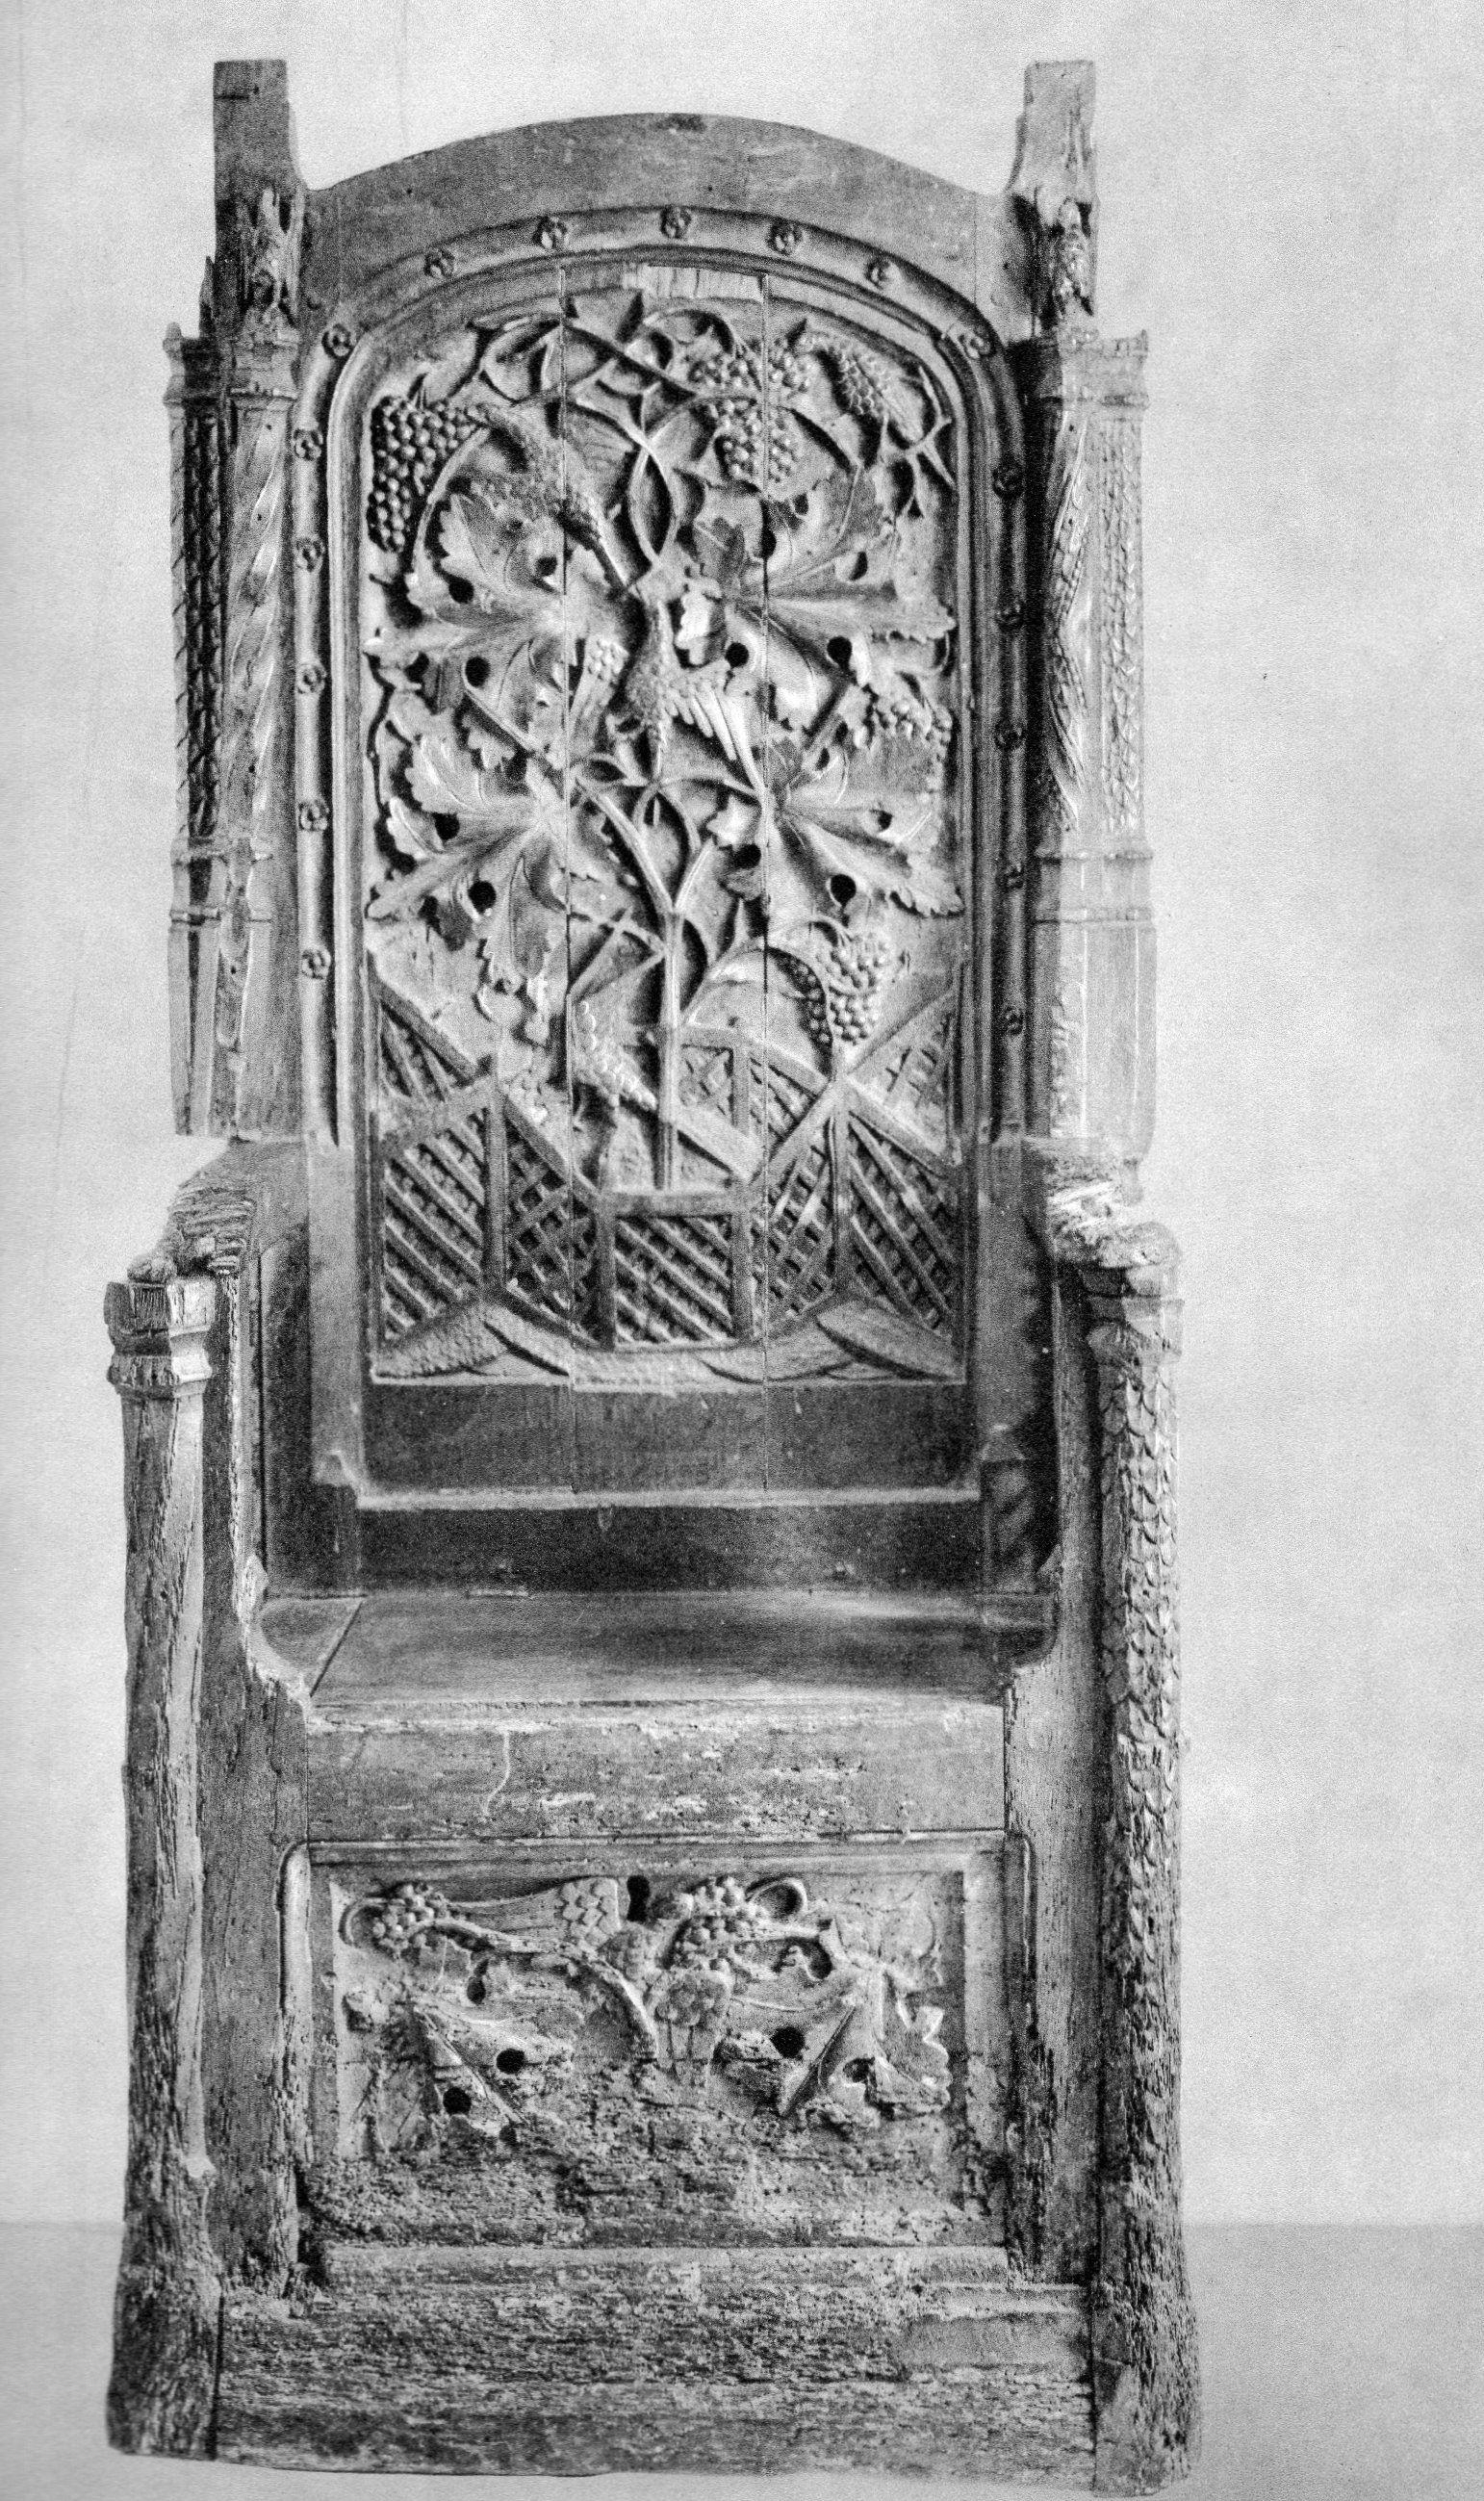 Black Gothic Throne Chair Home Depot Hammock Google Search Furniture